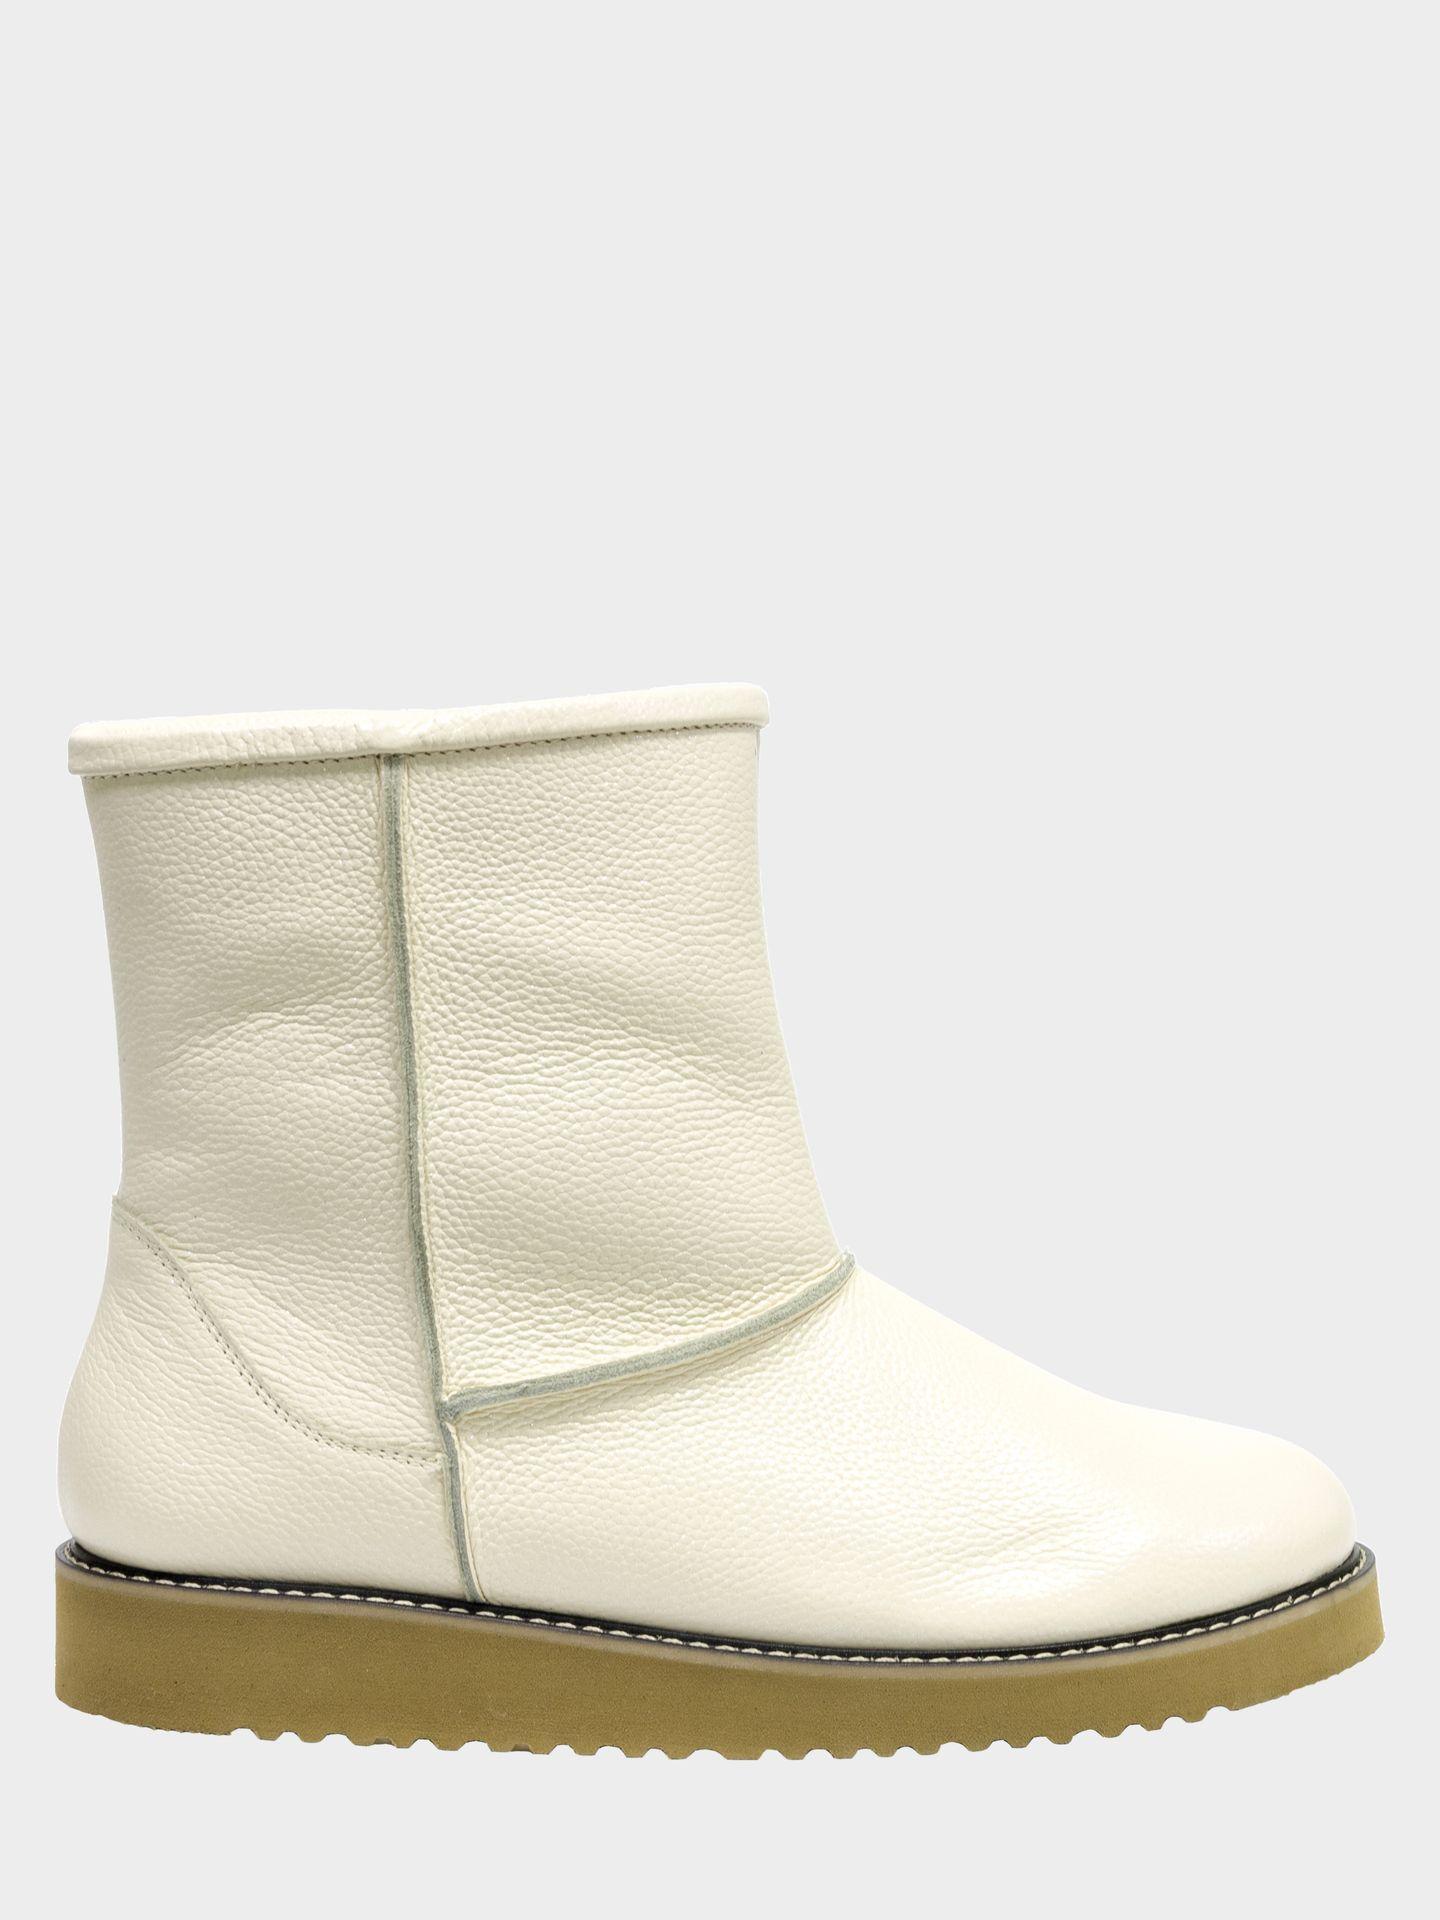 Купить Ботинки женские Gino Figini GF-1993-01, Бежевый